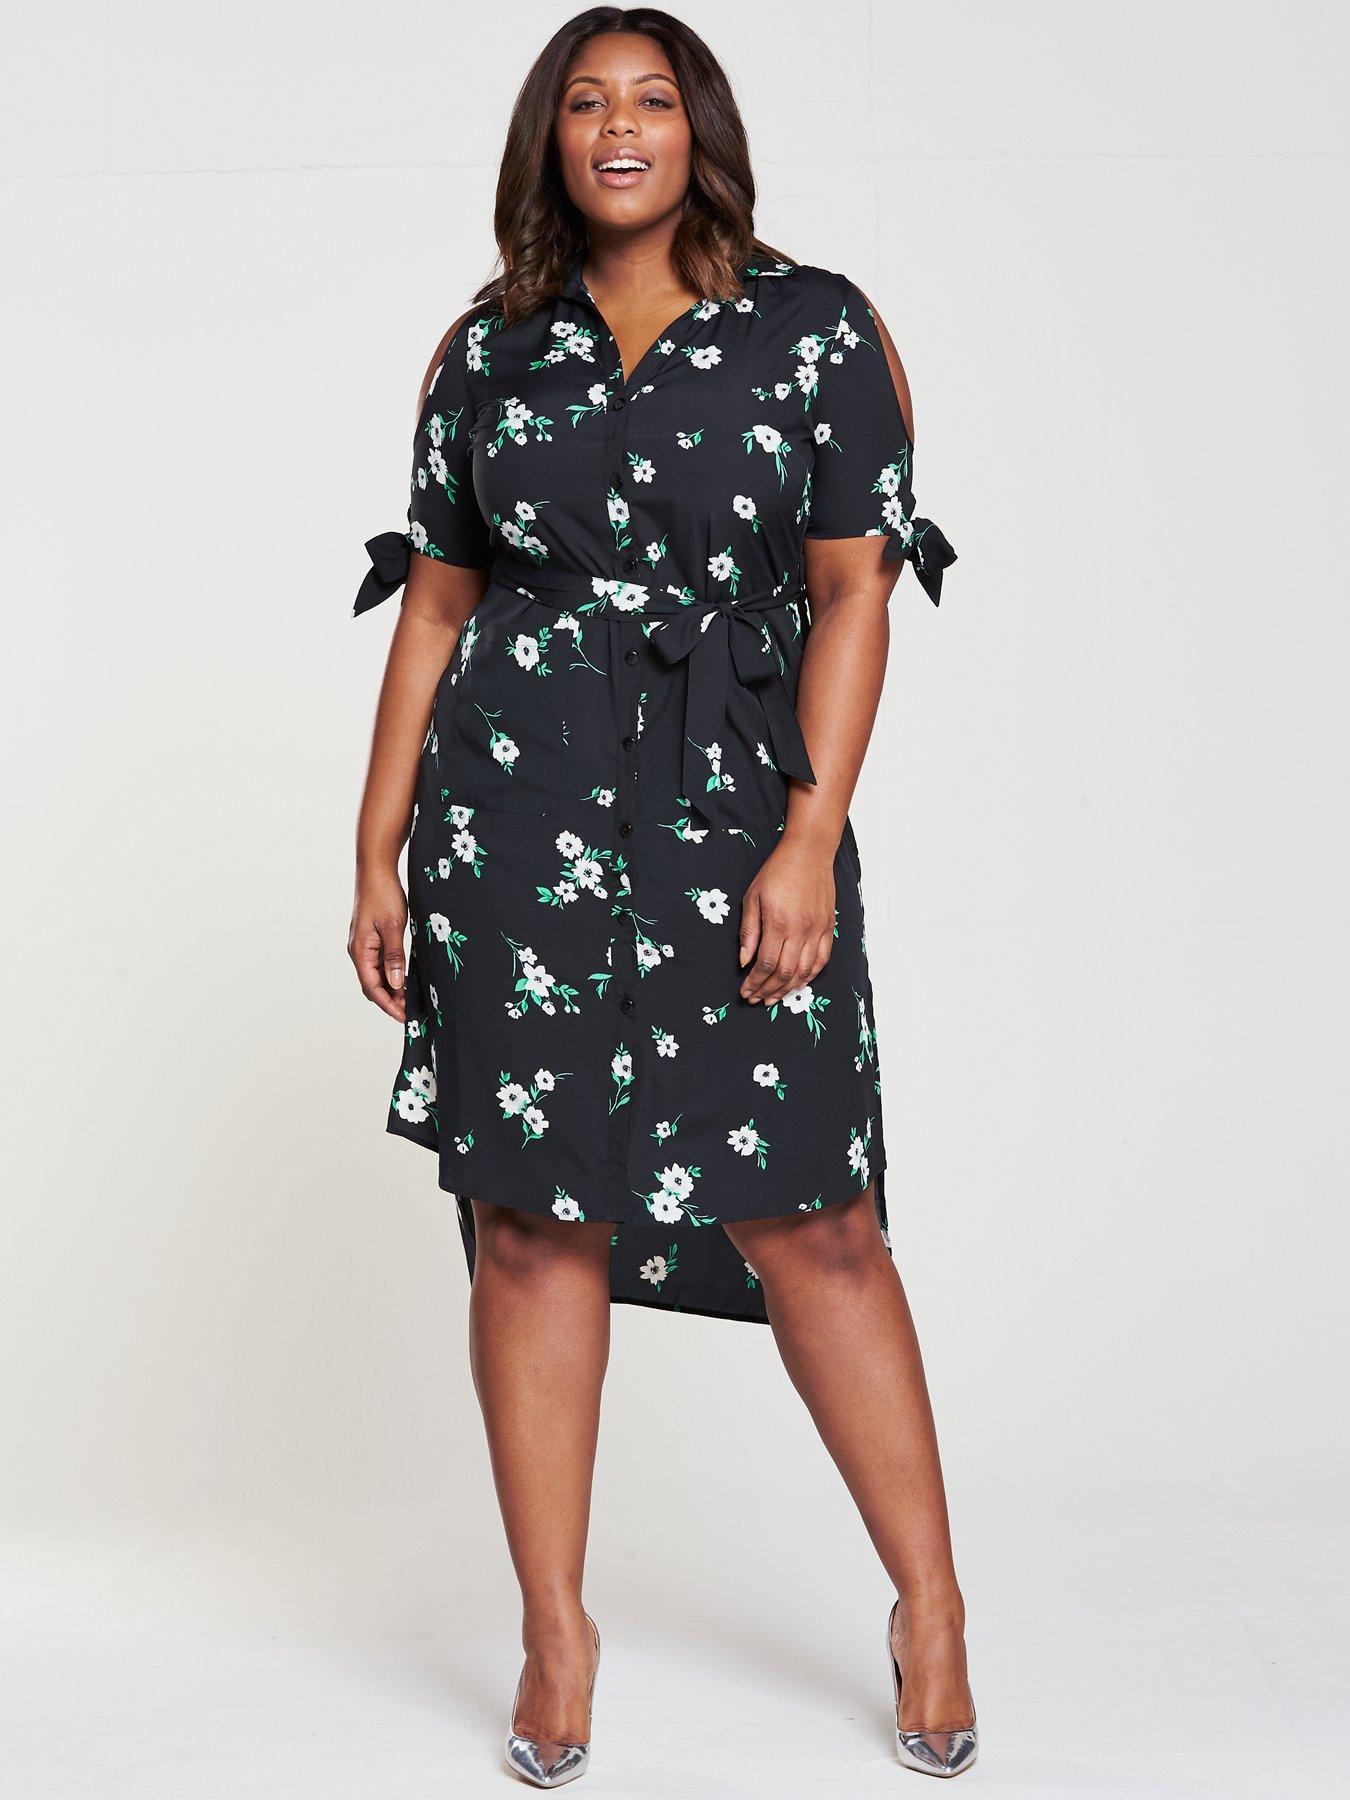 Shirt Dresses UK